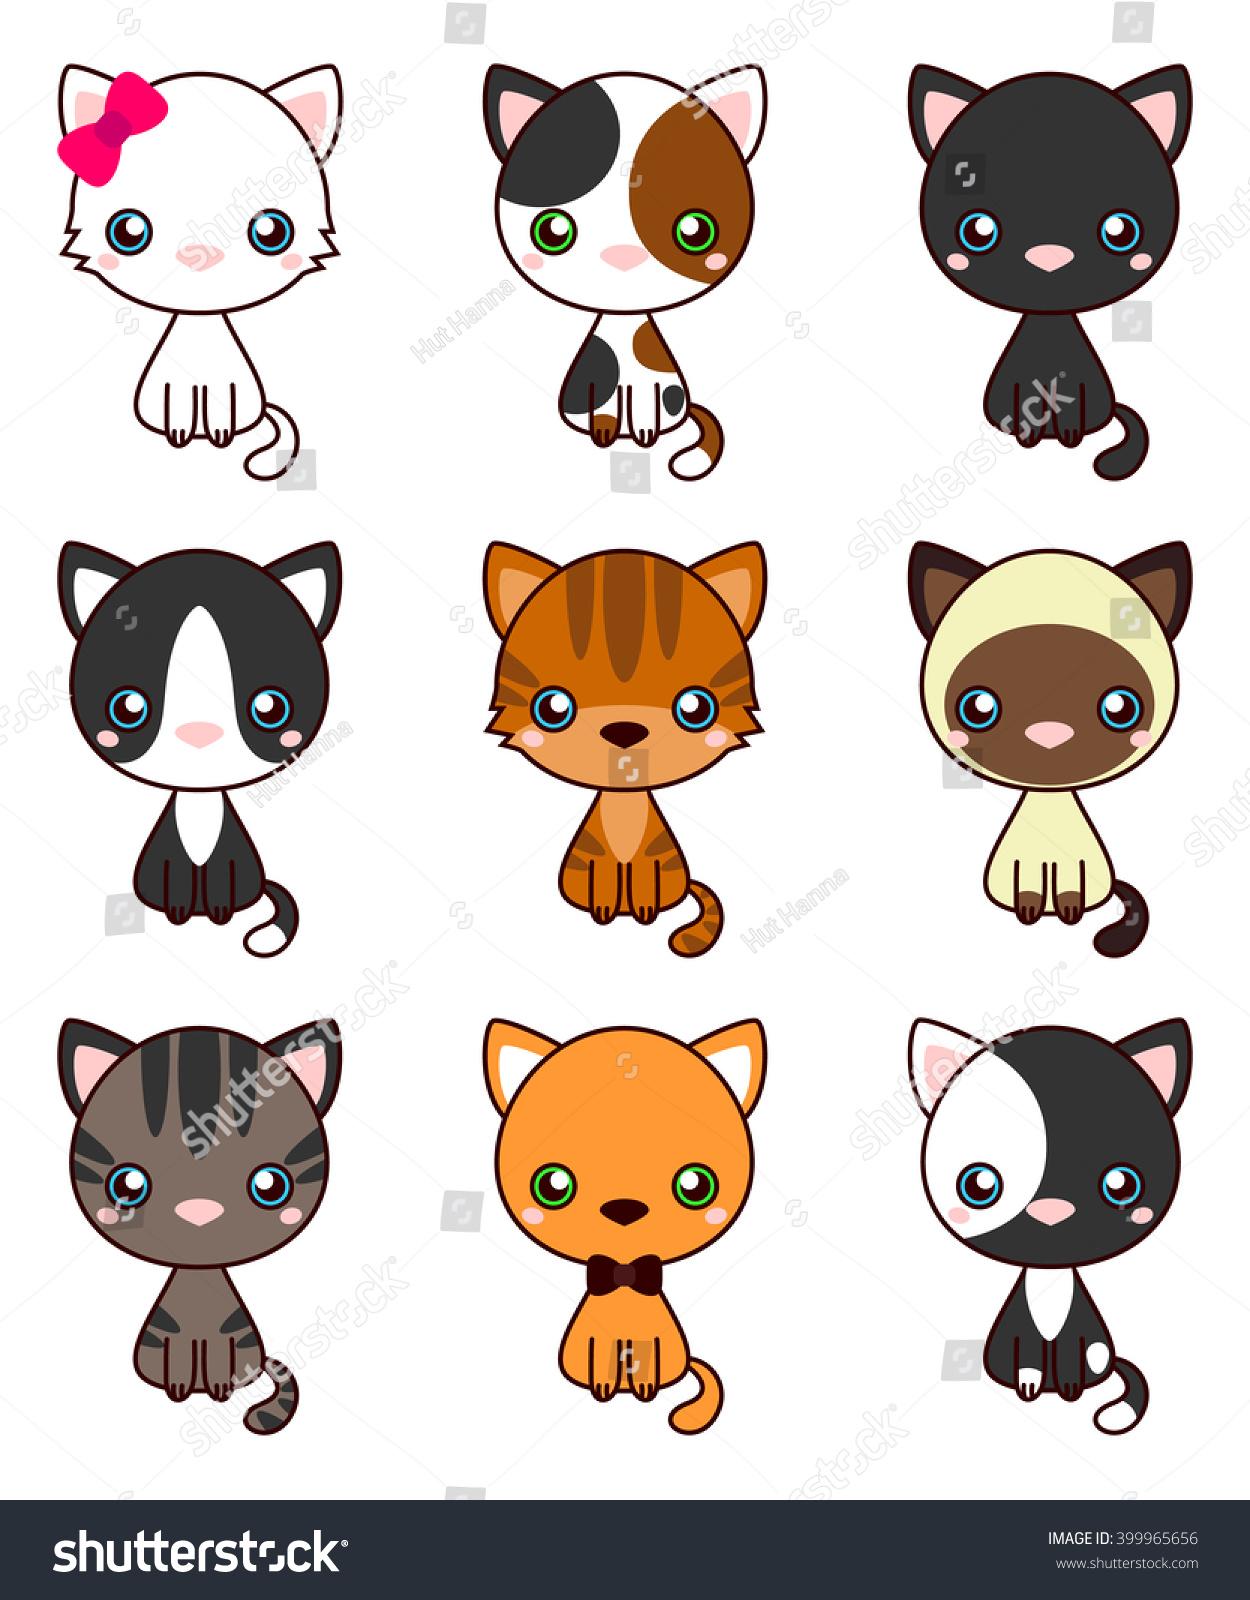 cat set black cat white cat stock vector royalty free 399965656 https www shutterstock com image vector cat set black white grey brown 399965656